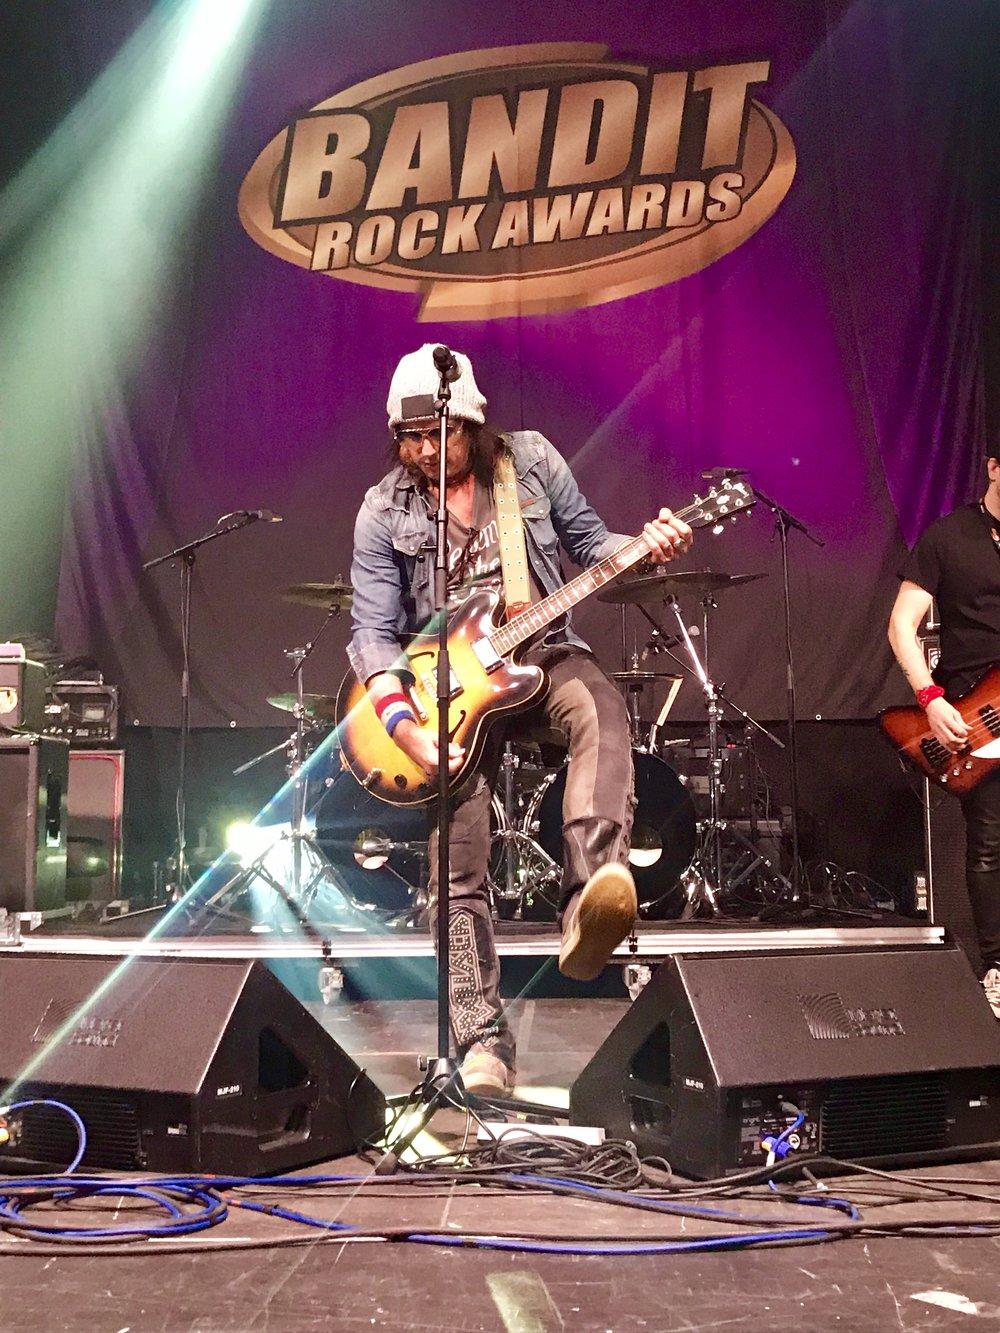 Ryan during soundcheck at the Bandit Rock Awards 2019